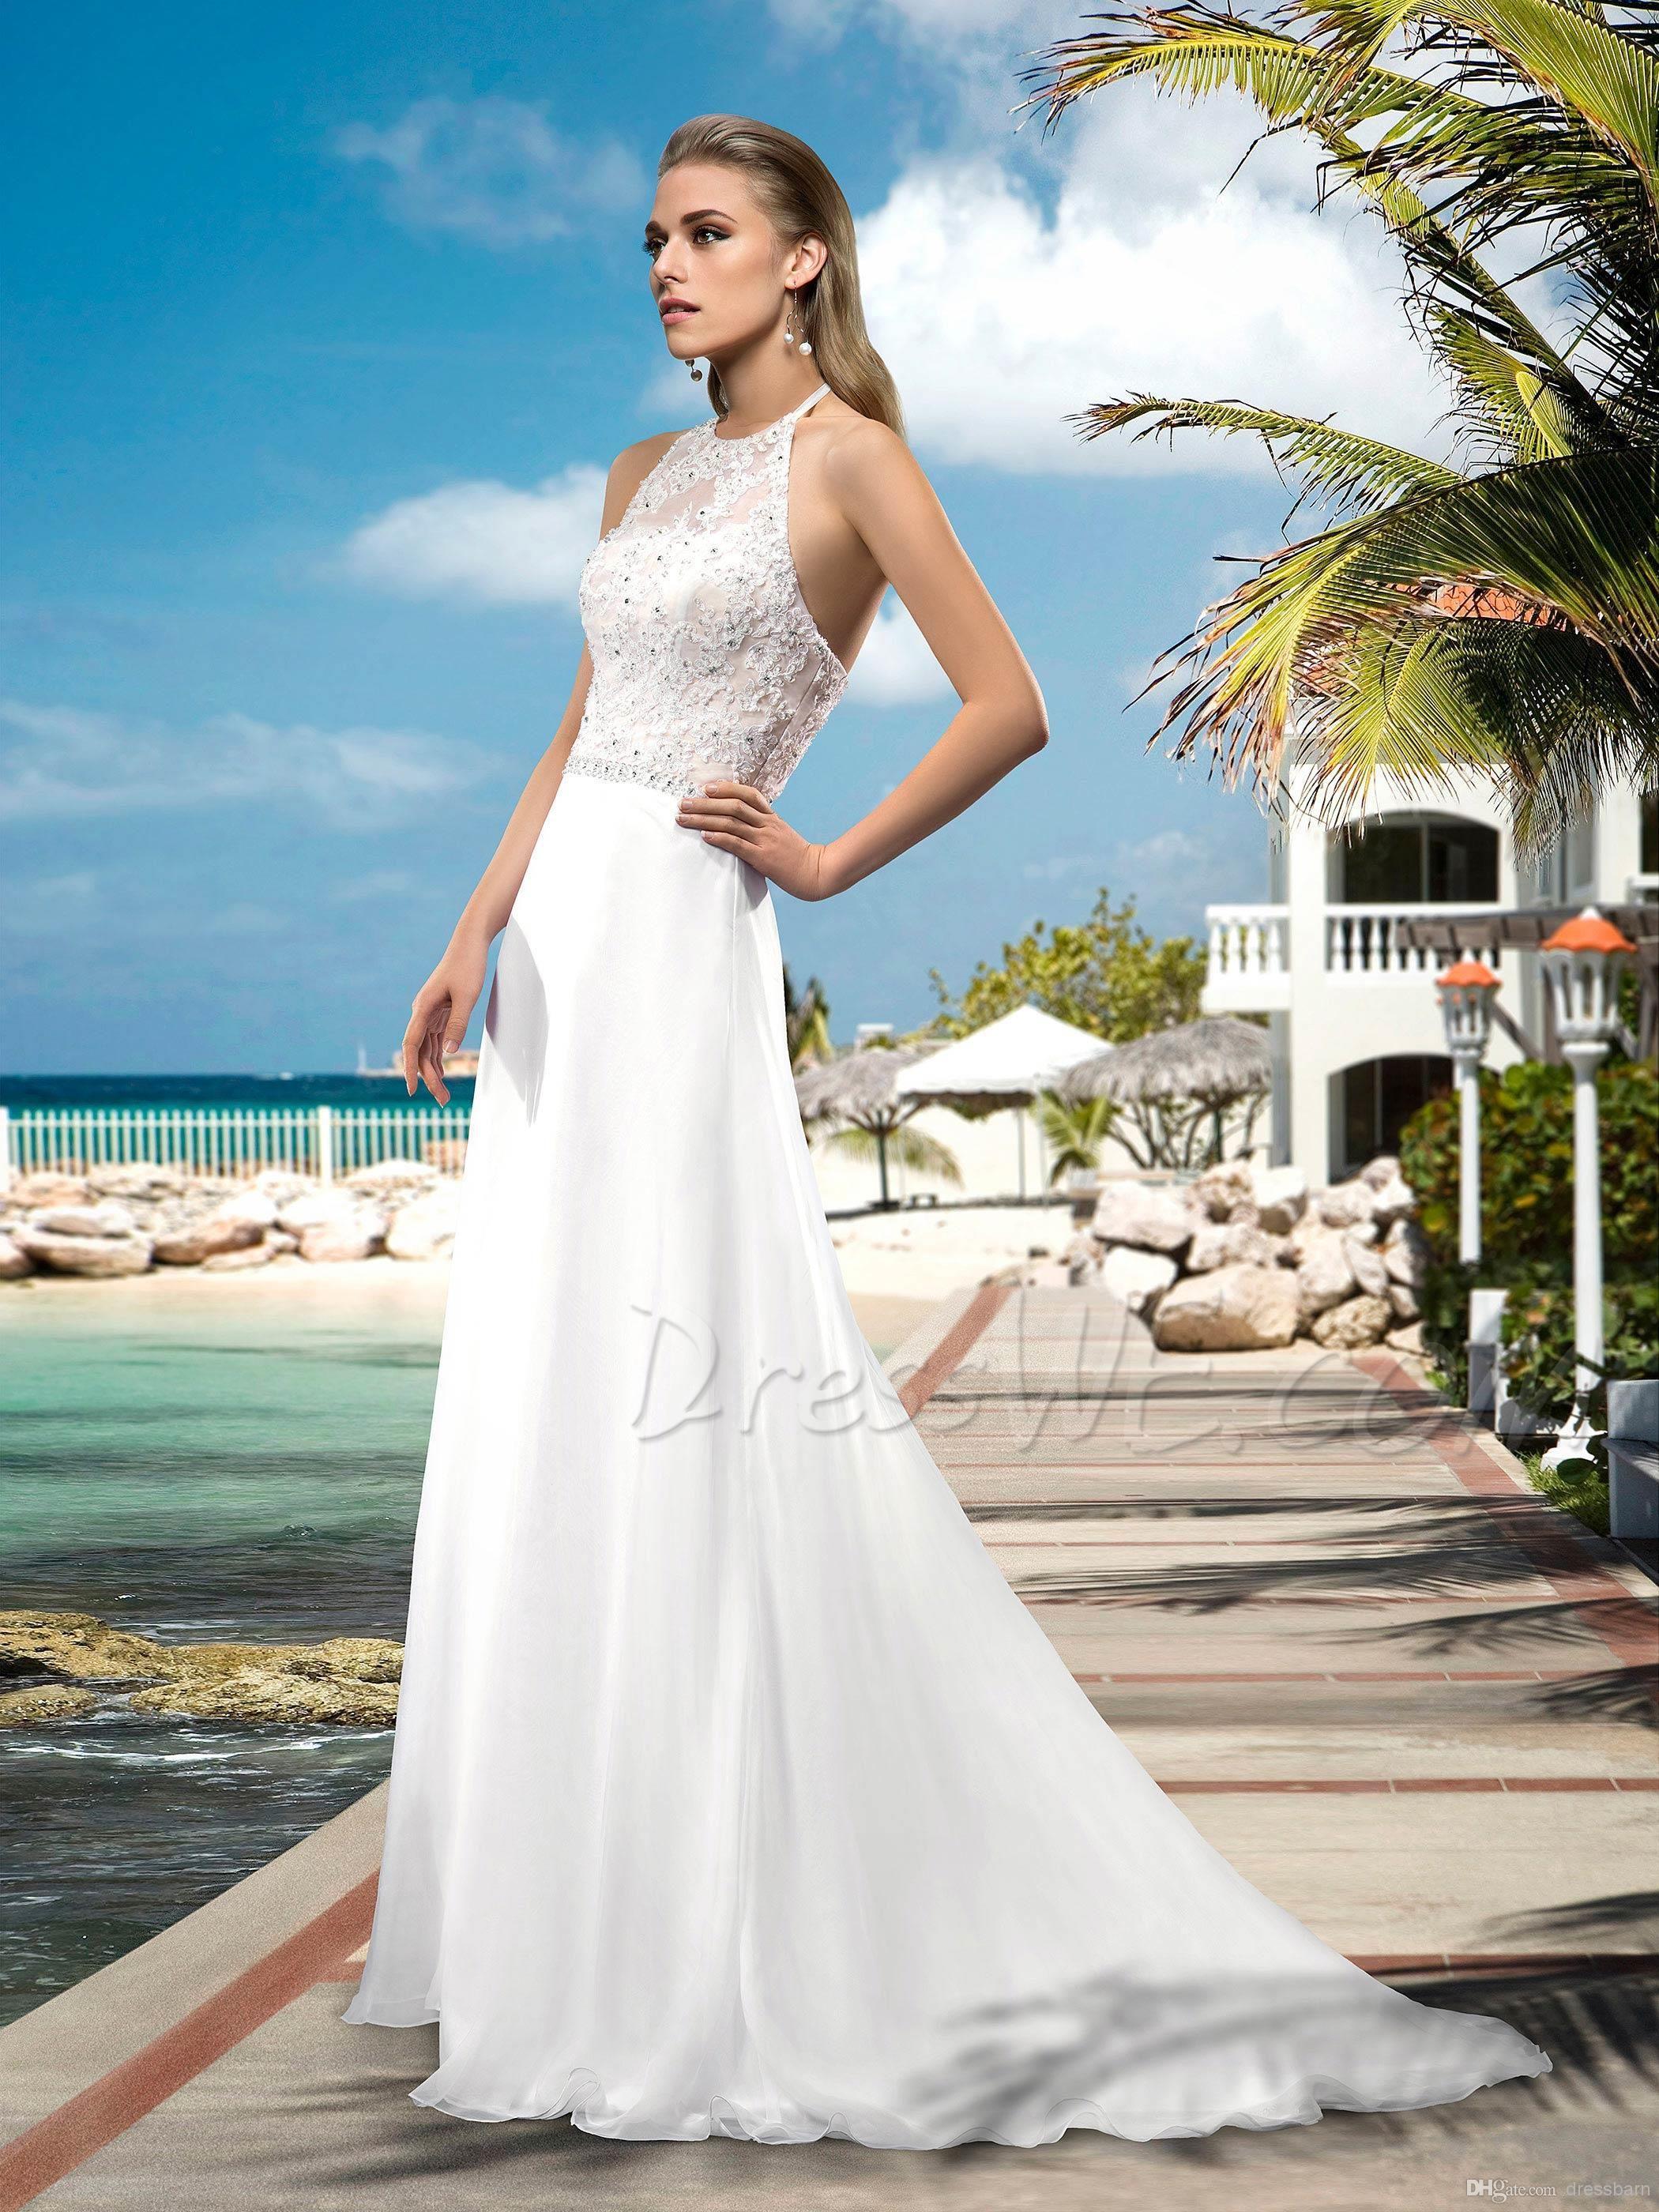 Sexy Halter Beach Wedding Dresses Sleeveless With Wonderful ...